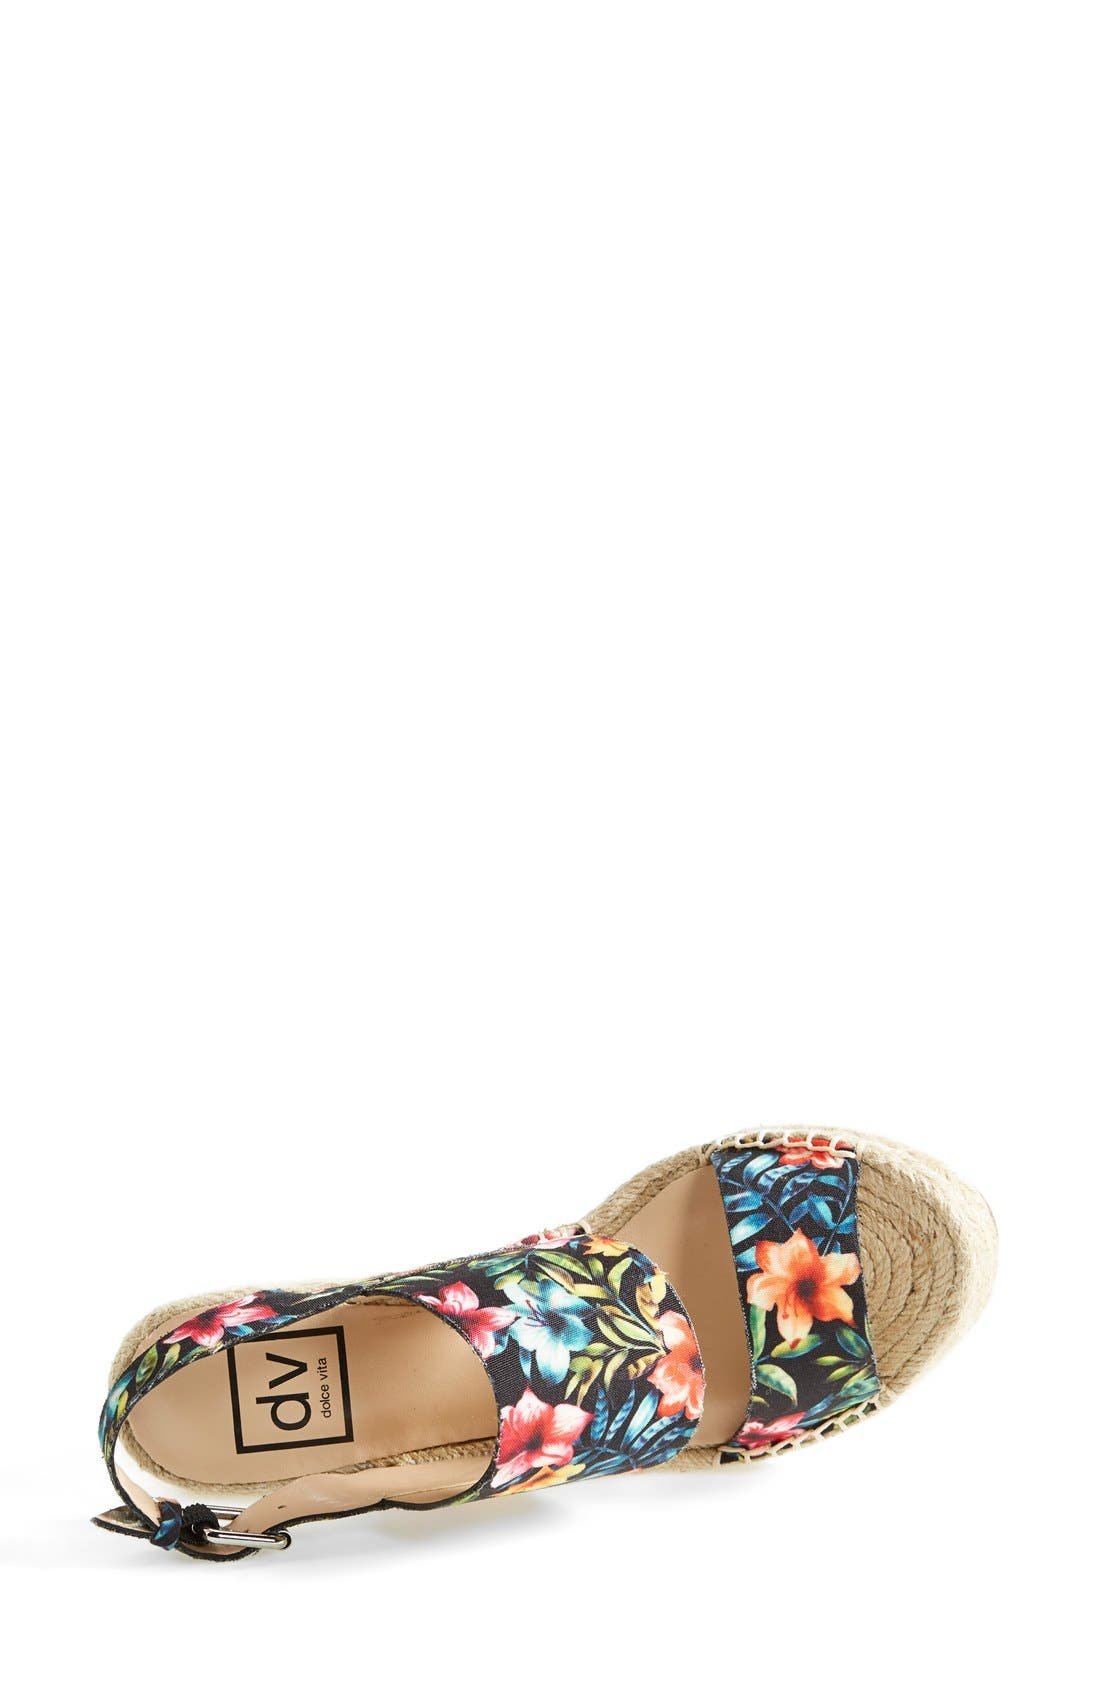 Alternate Image 3  - DV by Dolce Vita 'Shady' Wedge Sandal (Women)